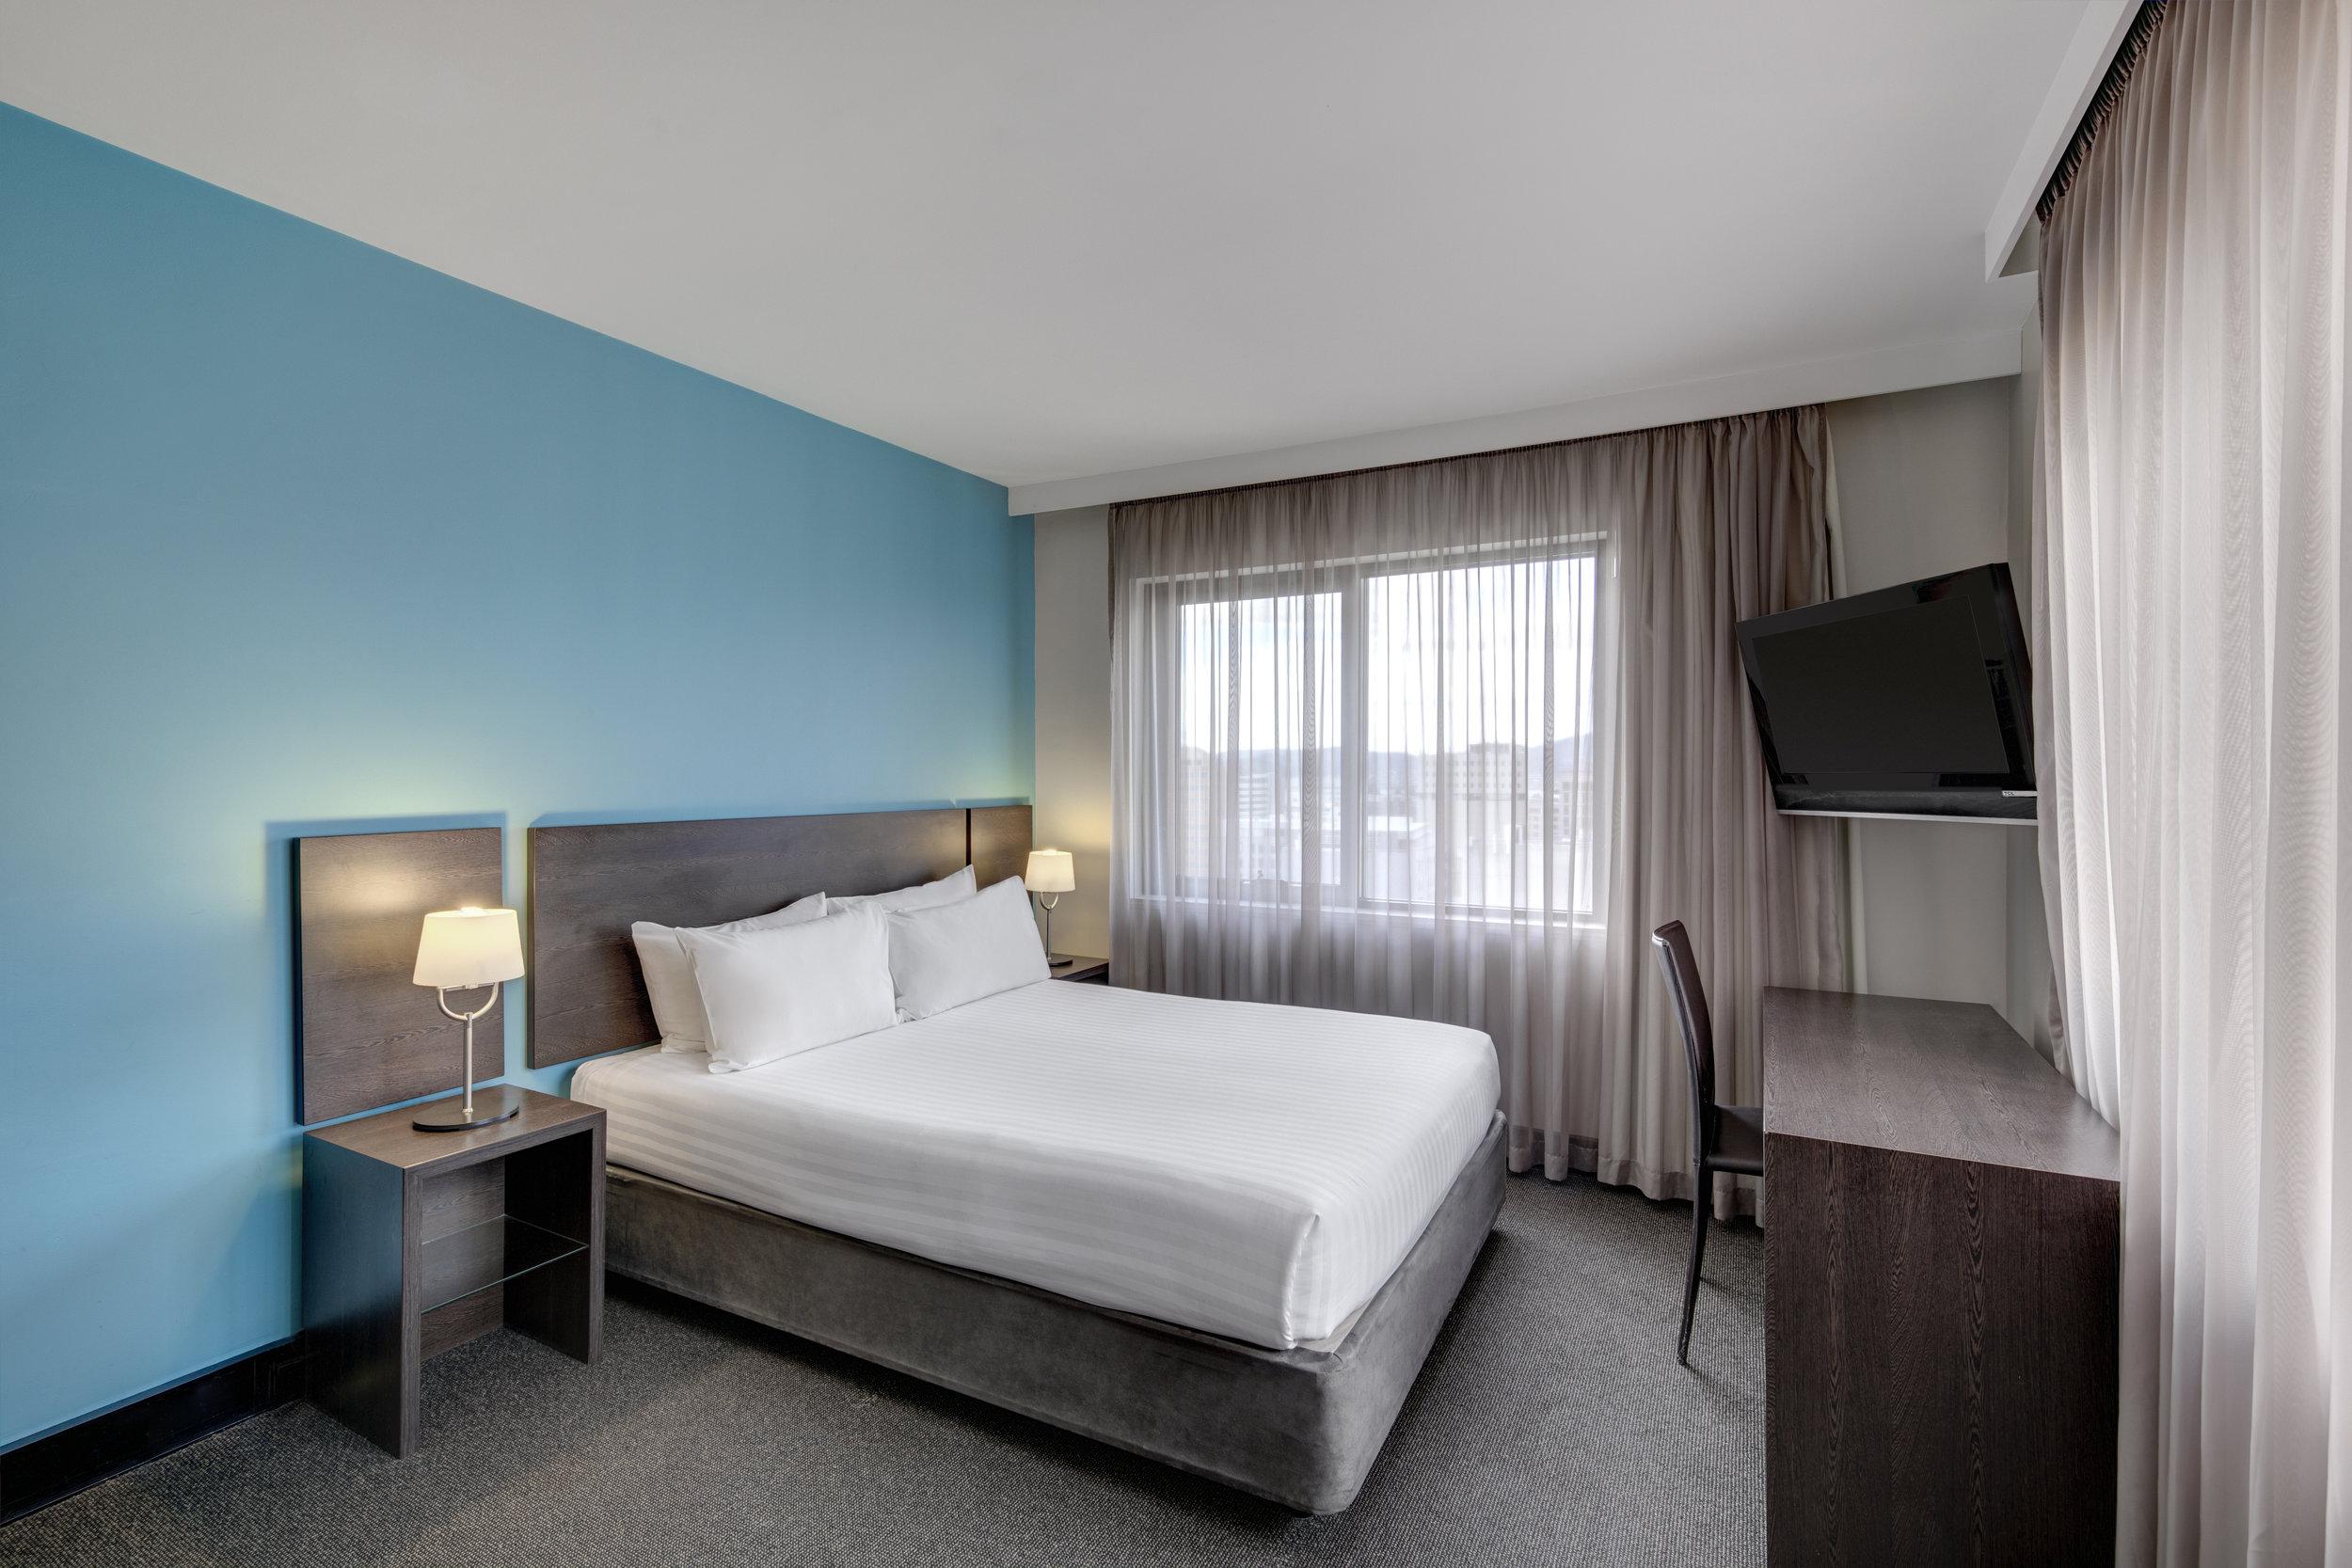 travelodge-hotel-hobart-guest-room-queen-02-2016.jpg